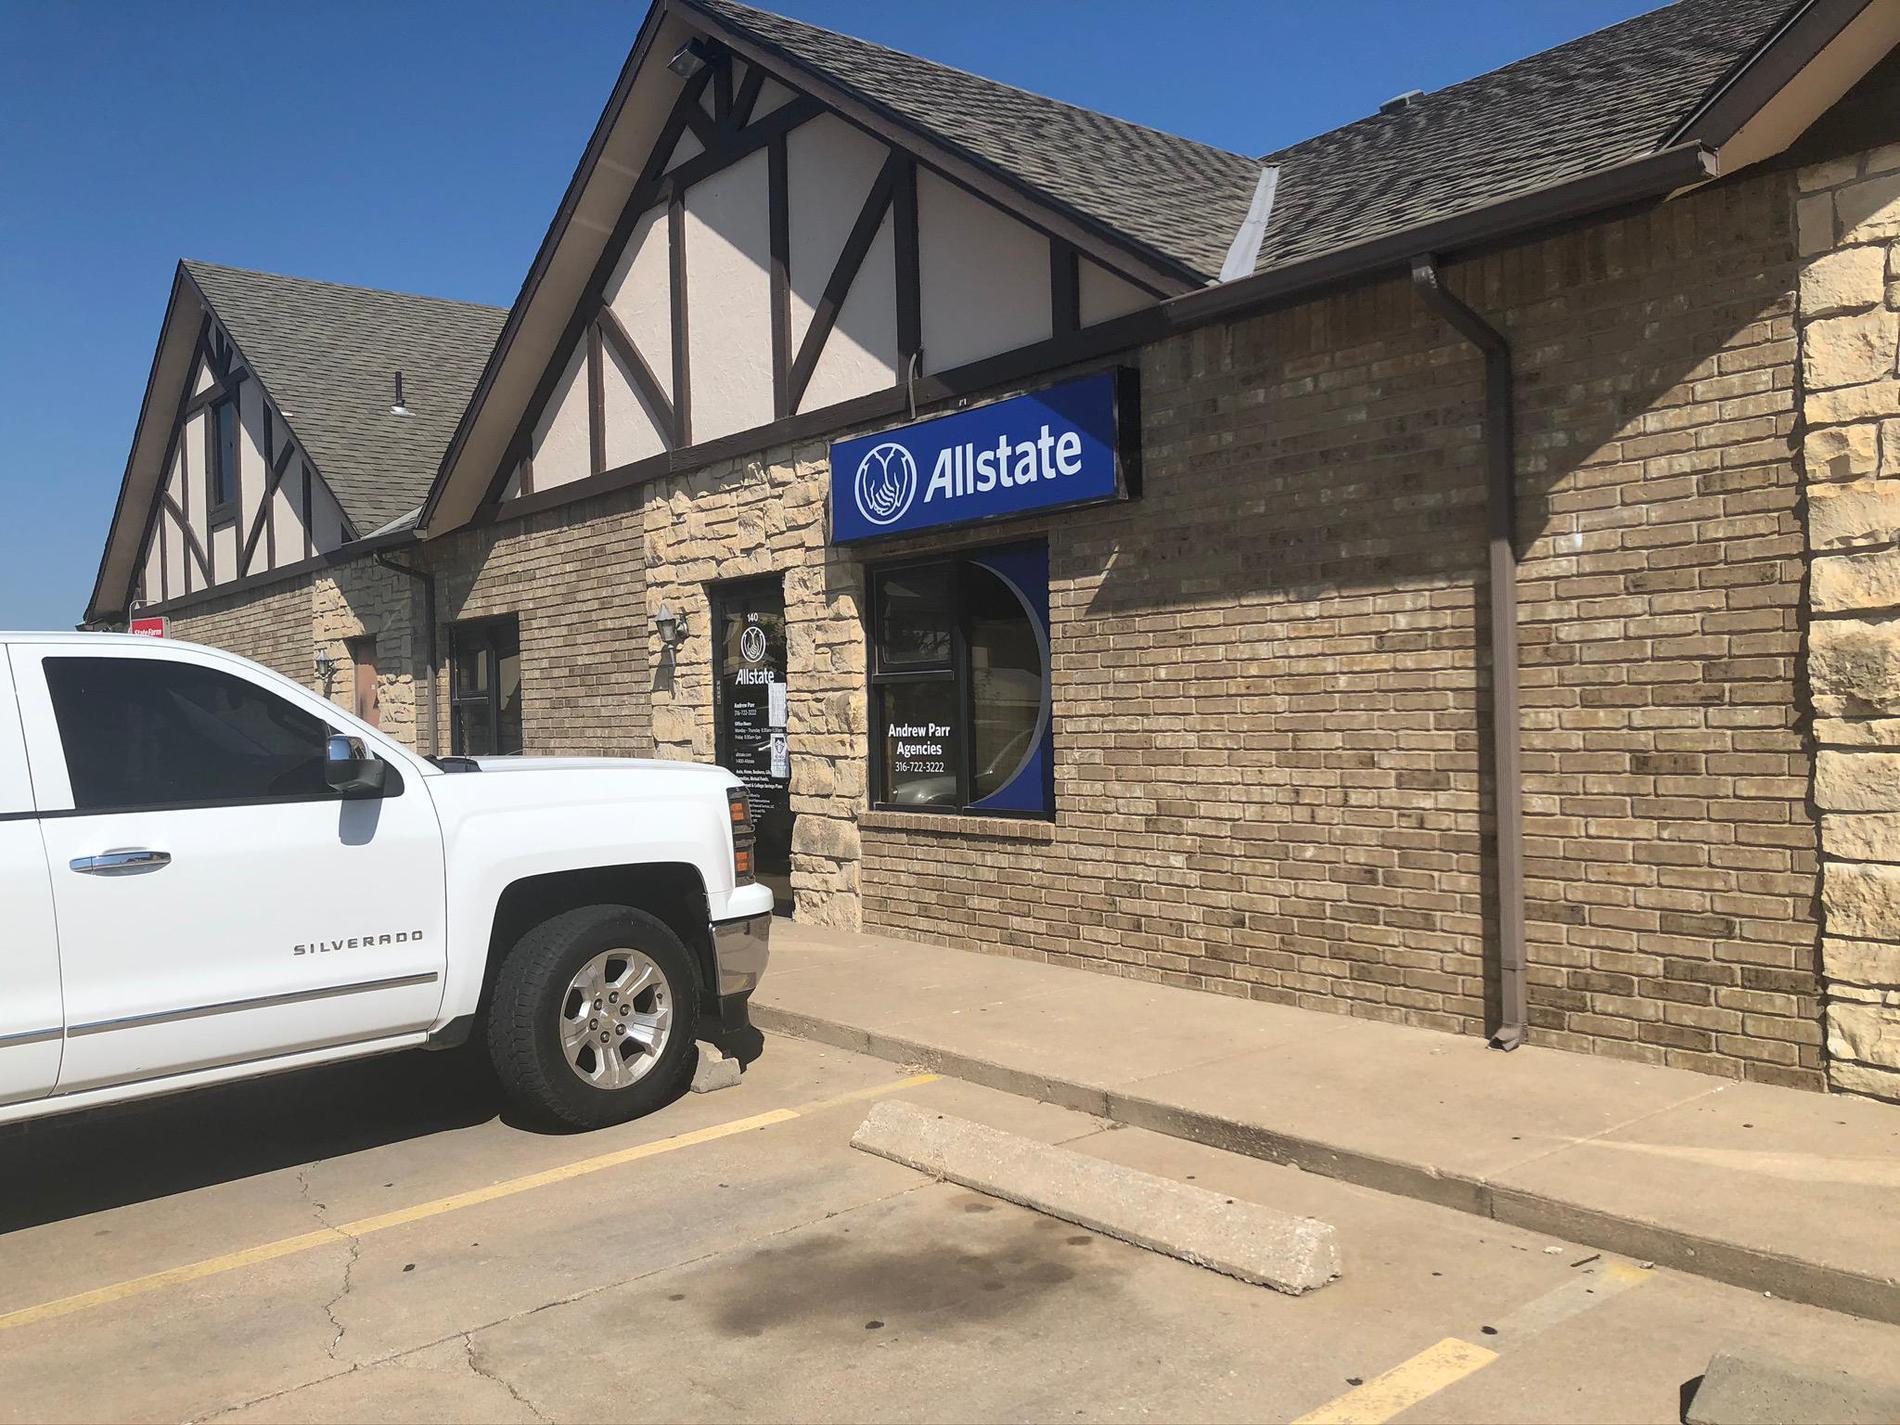 Allstate | Car Insurance in Wichita, KS - Andrew Parr